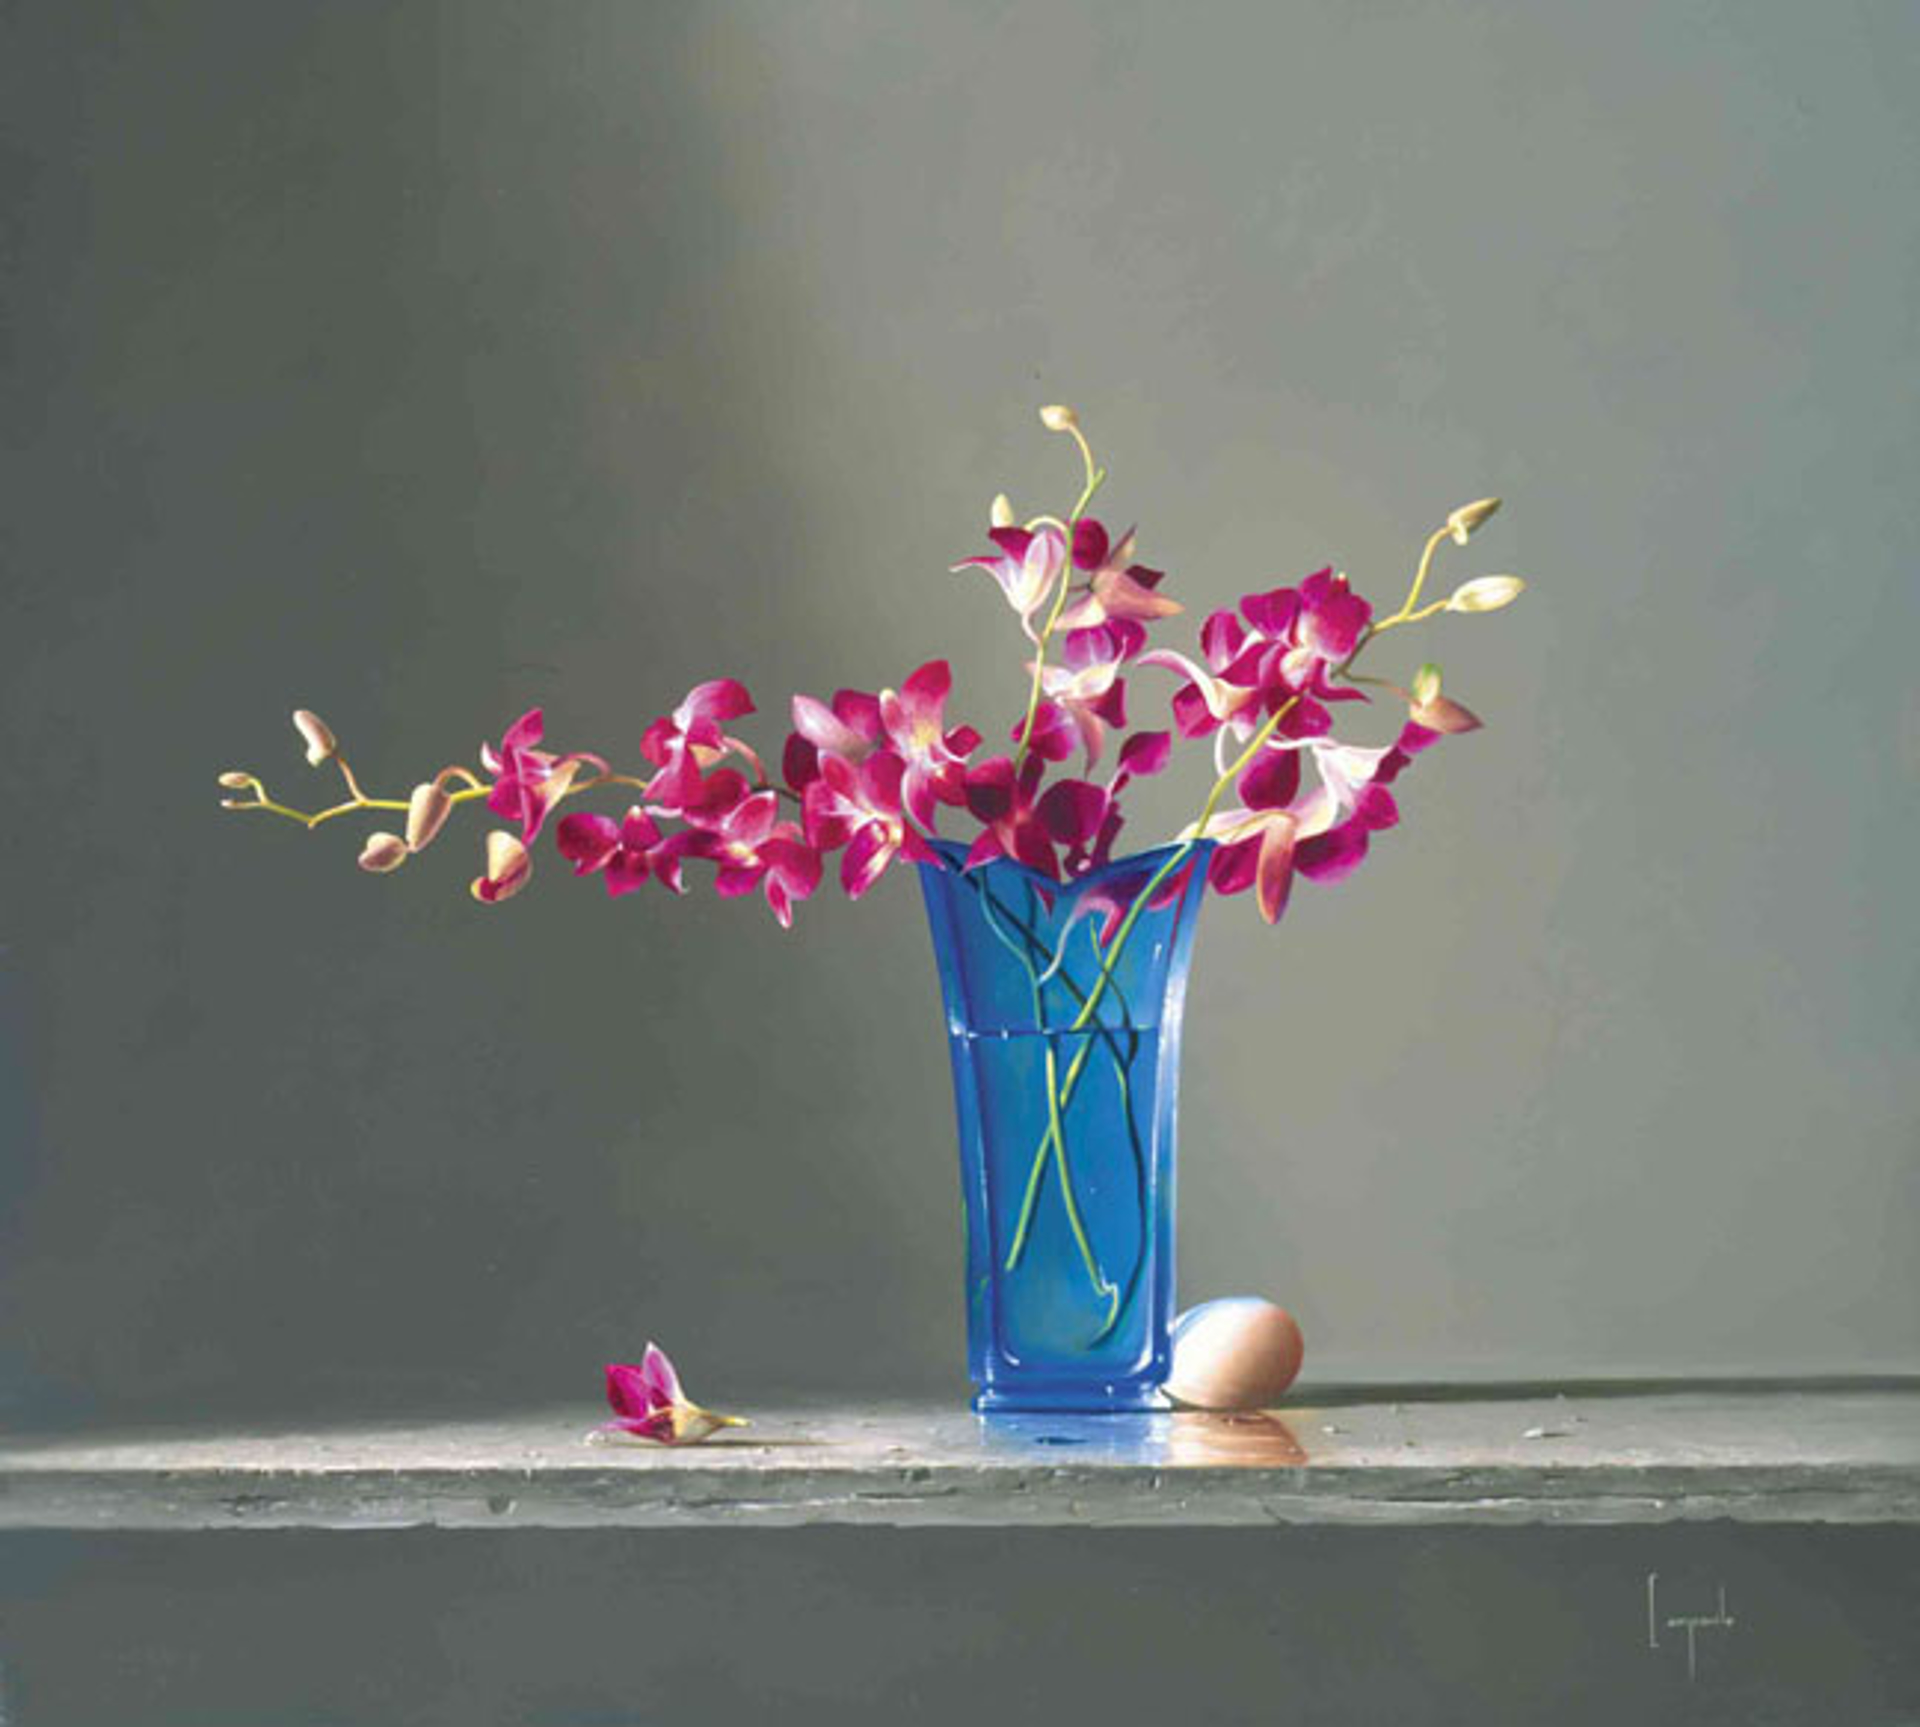 Blue Egg by Dario Campanile